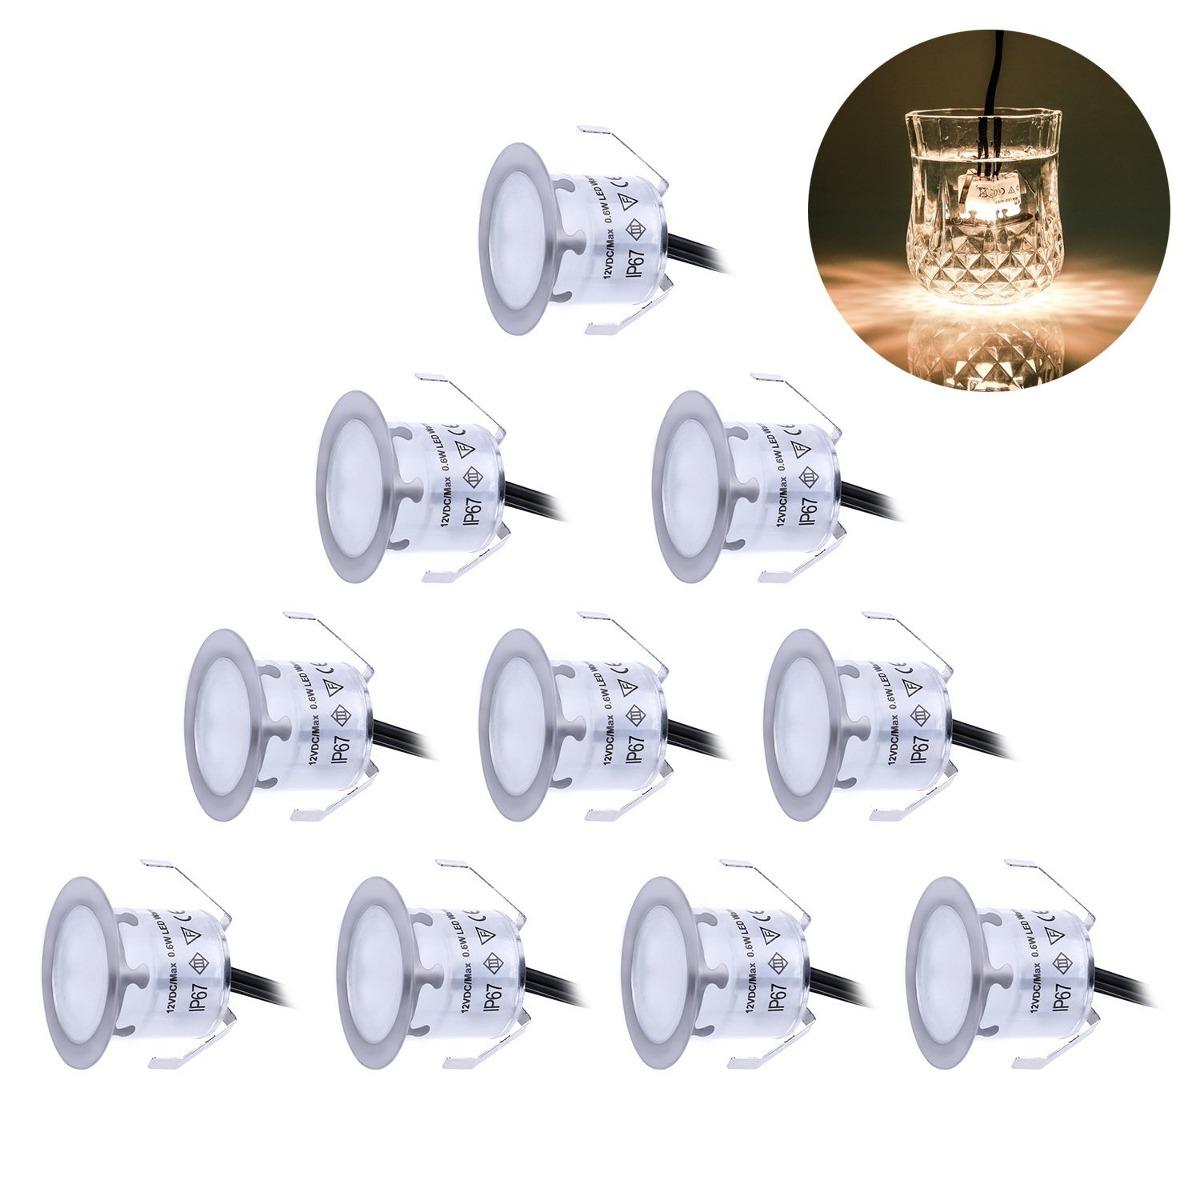 Recessed led deck lighting kits 12v low voltage warm white f recessed led deck lighting kits 12v low voltage warm white f cargando zoom aloadofball Gallery